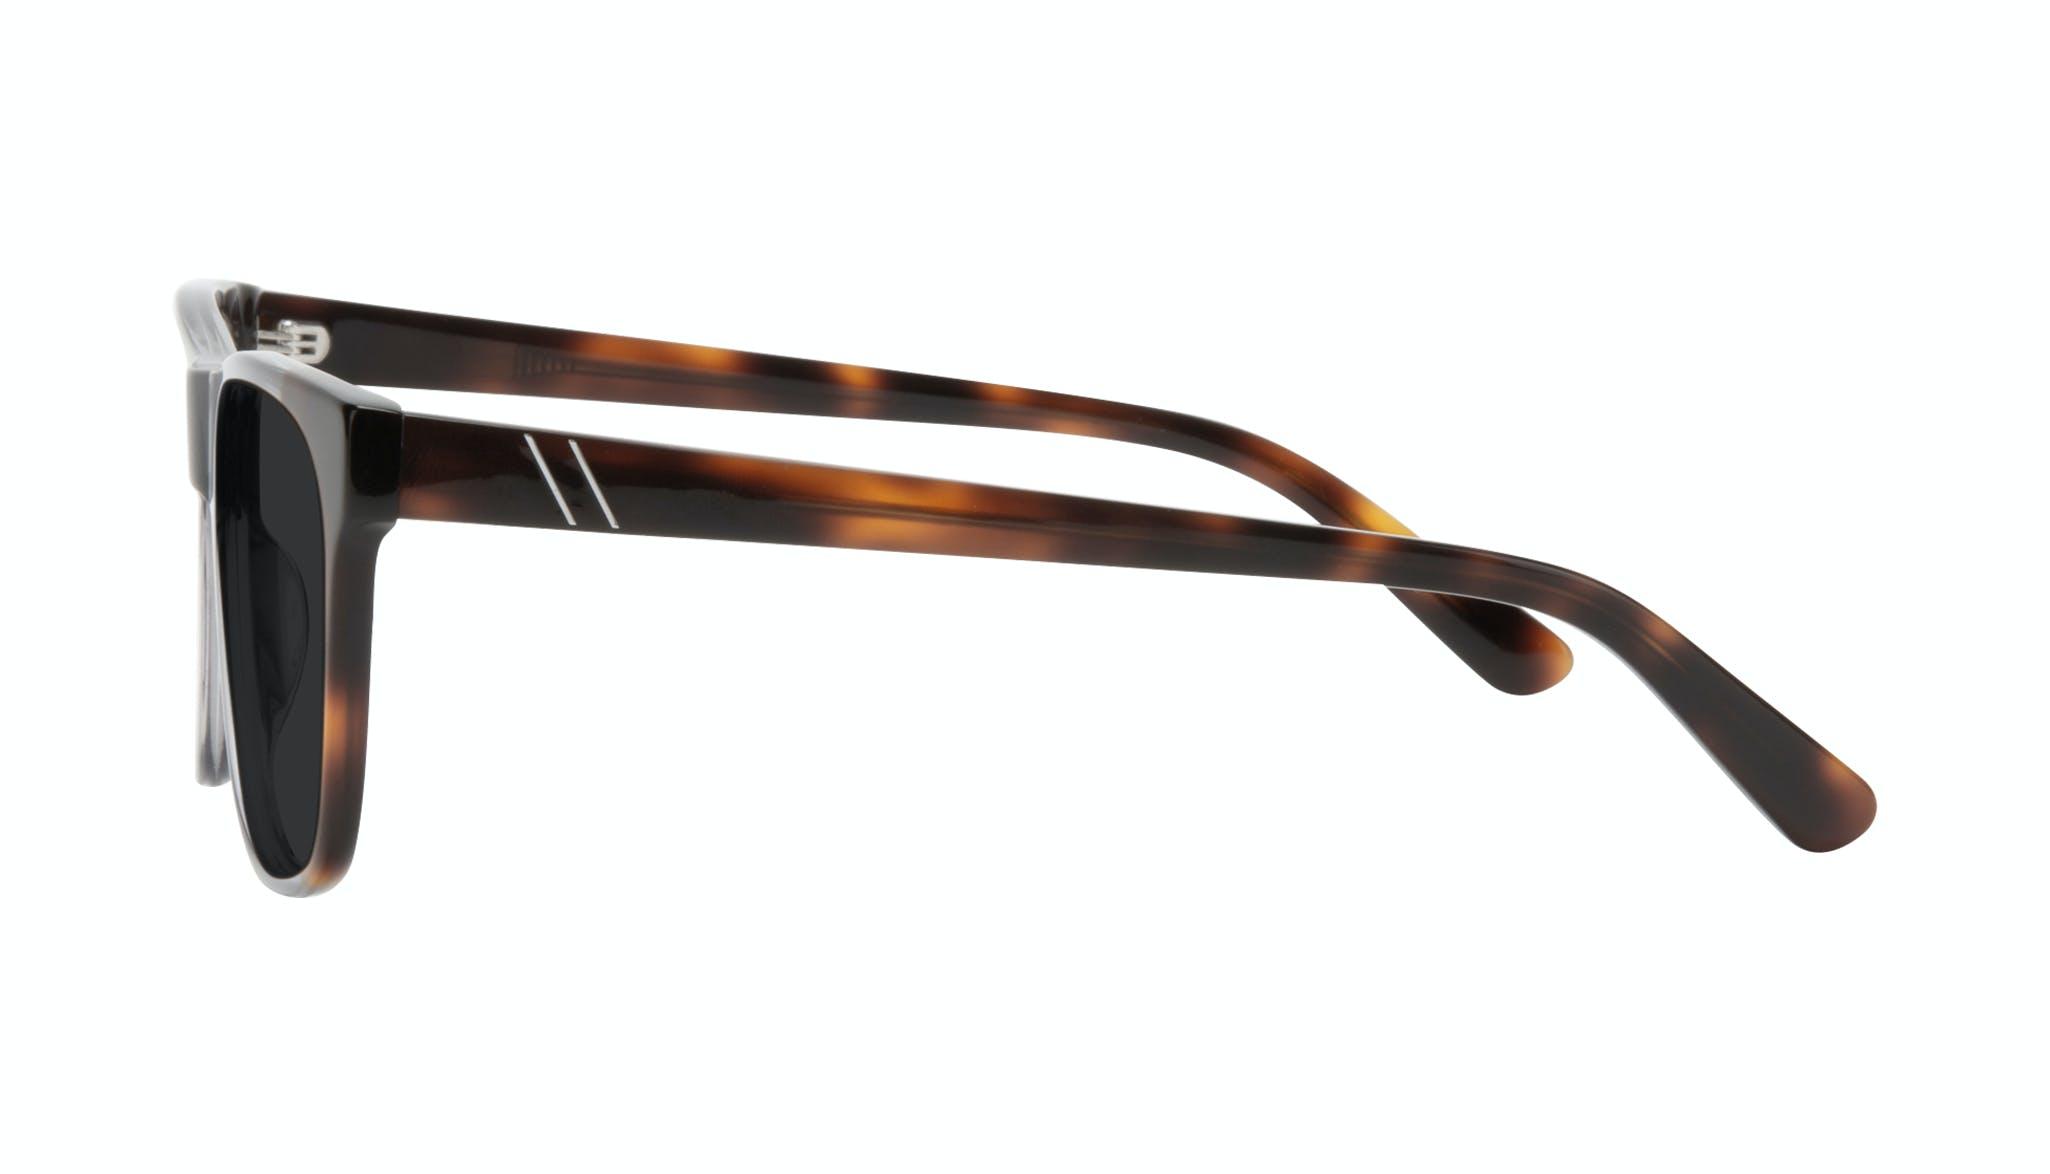 Affordable Fashion Glasses Square Sunglasses Men Make Smokey Tort Side